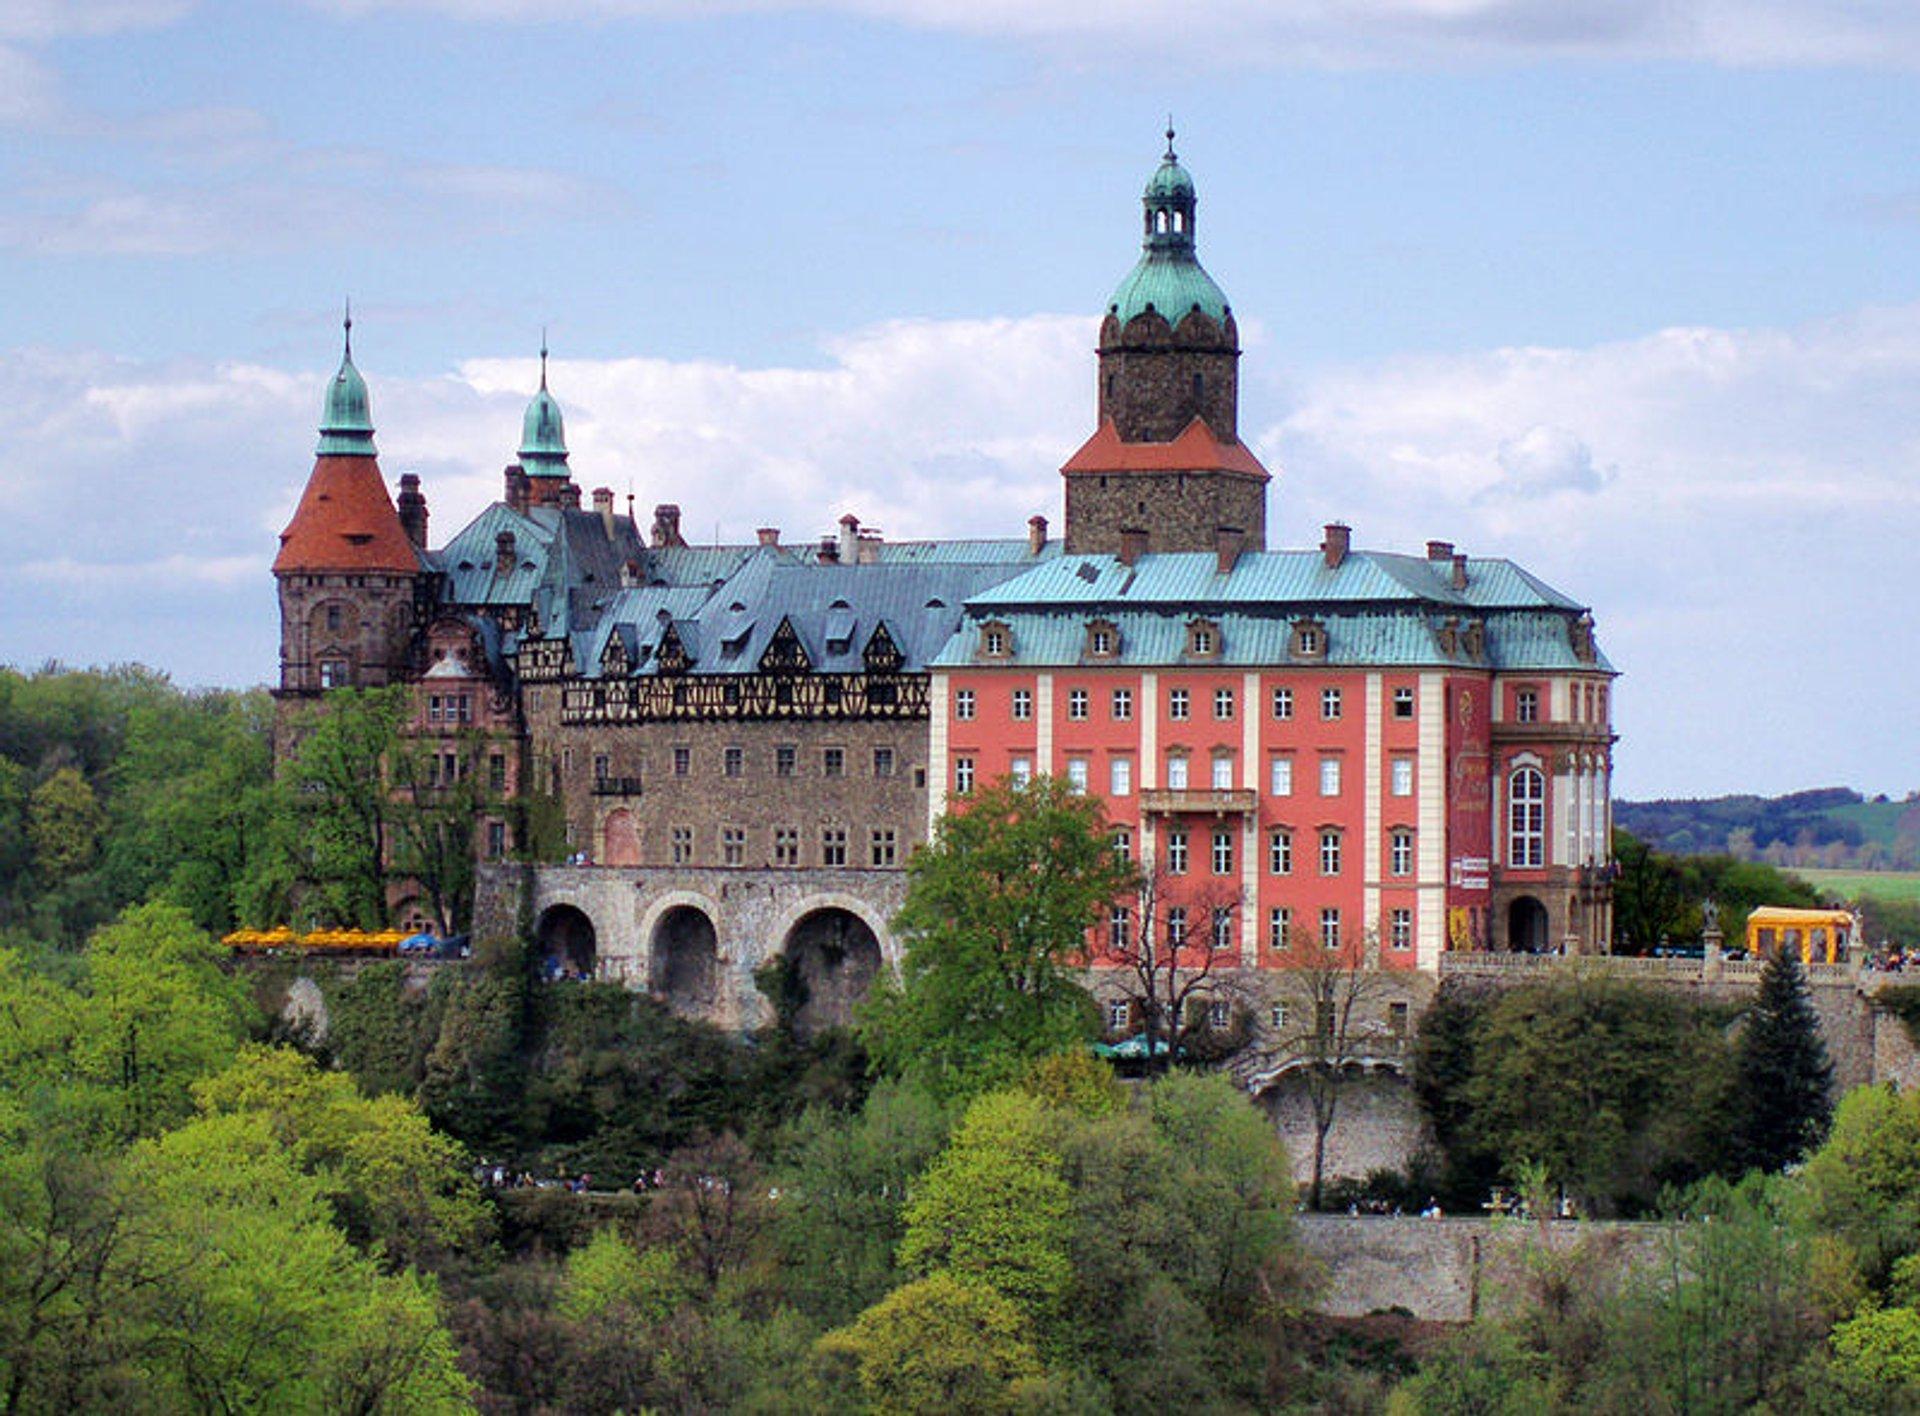 Best time to see Książ Castle (Zamek Książ) in Poland 2020